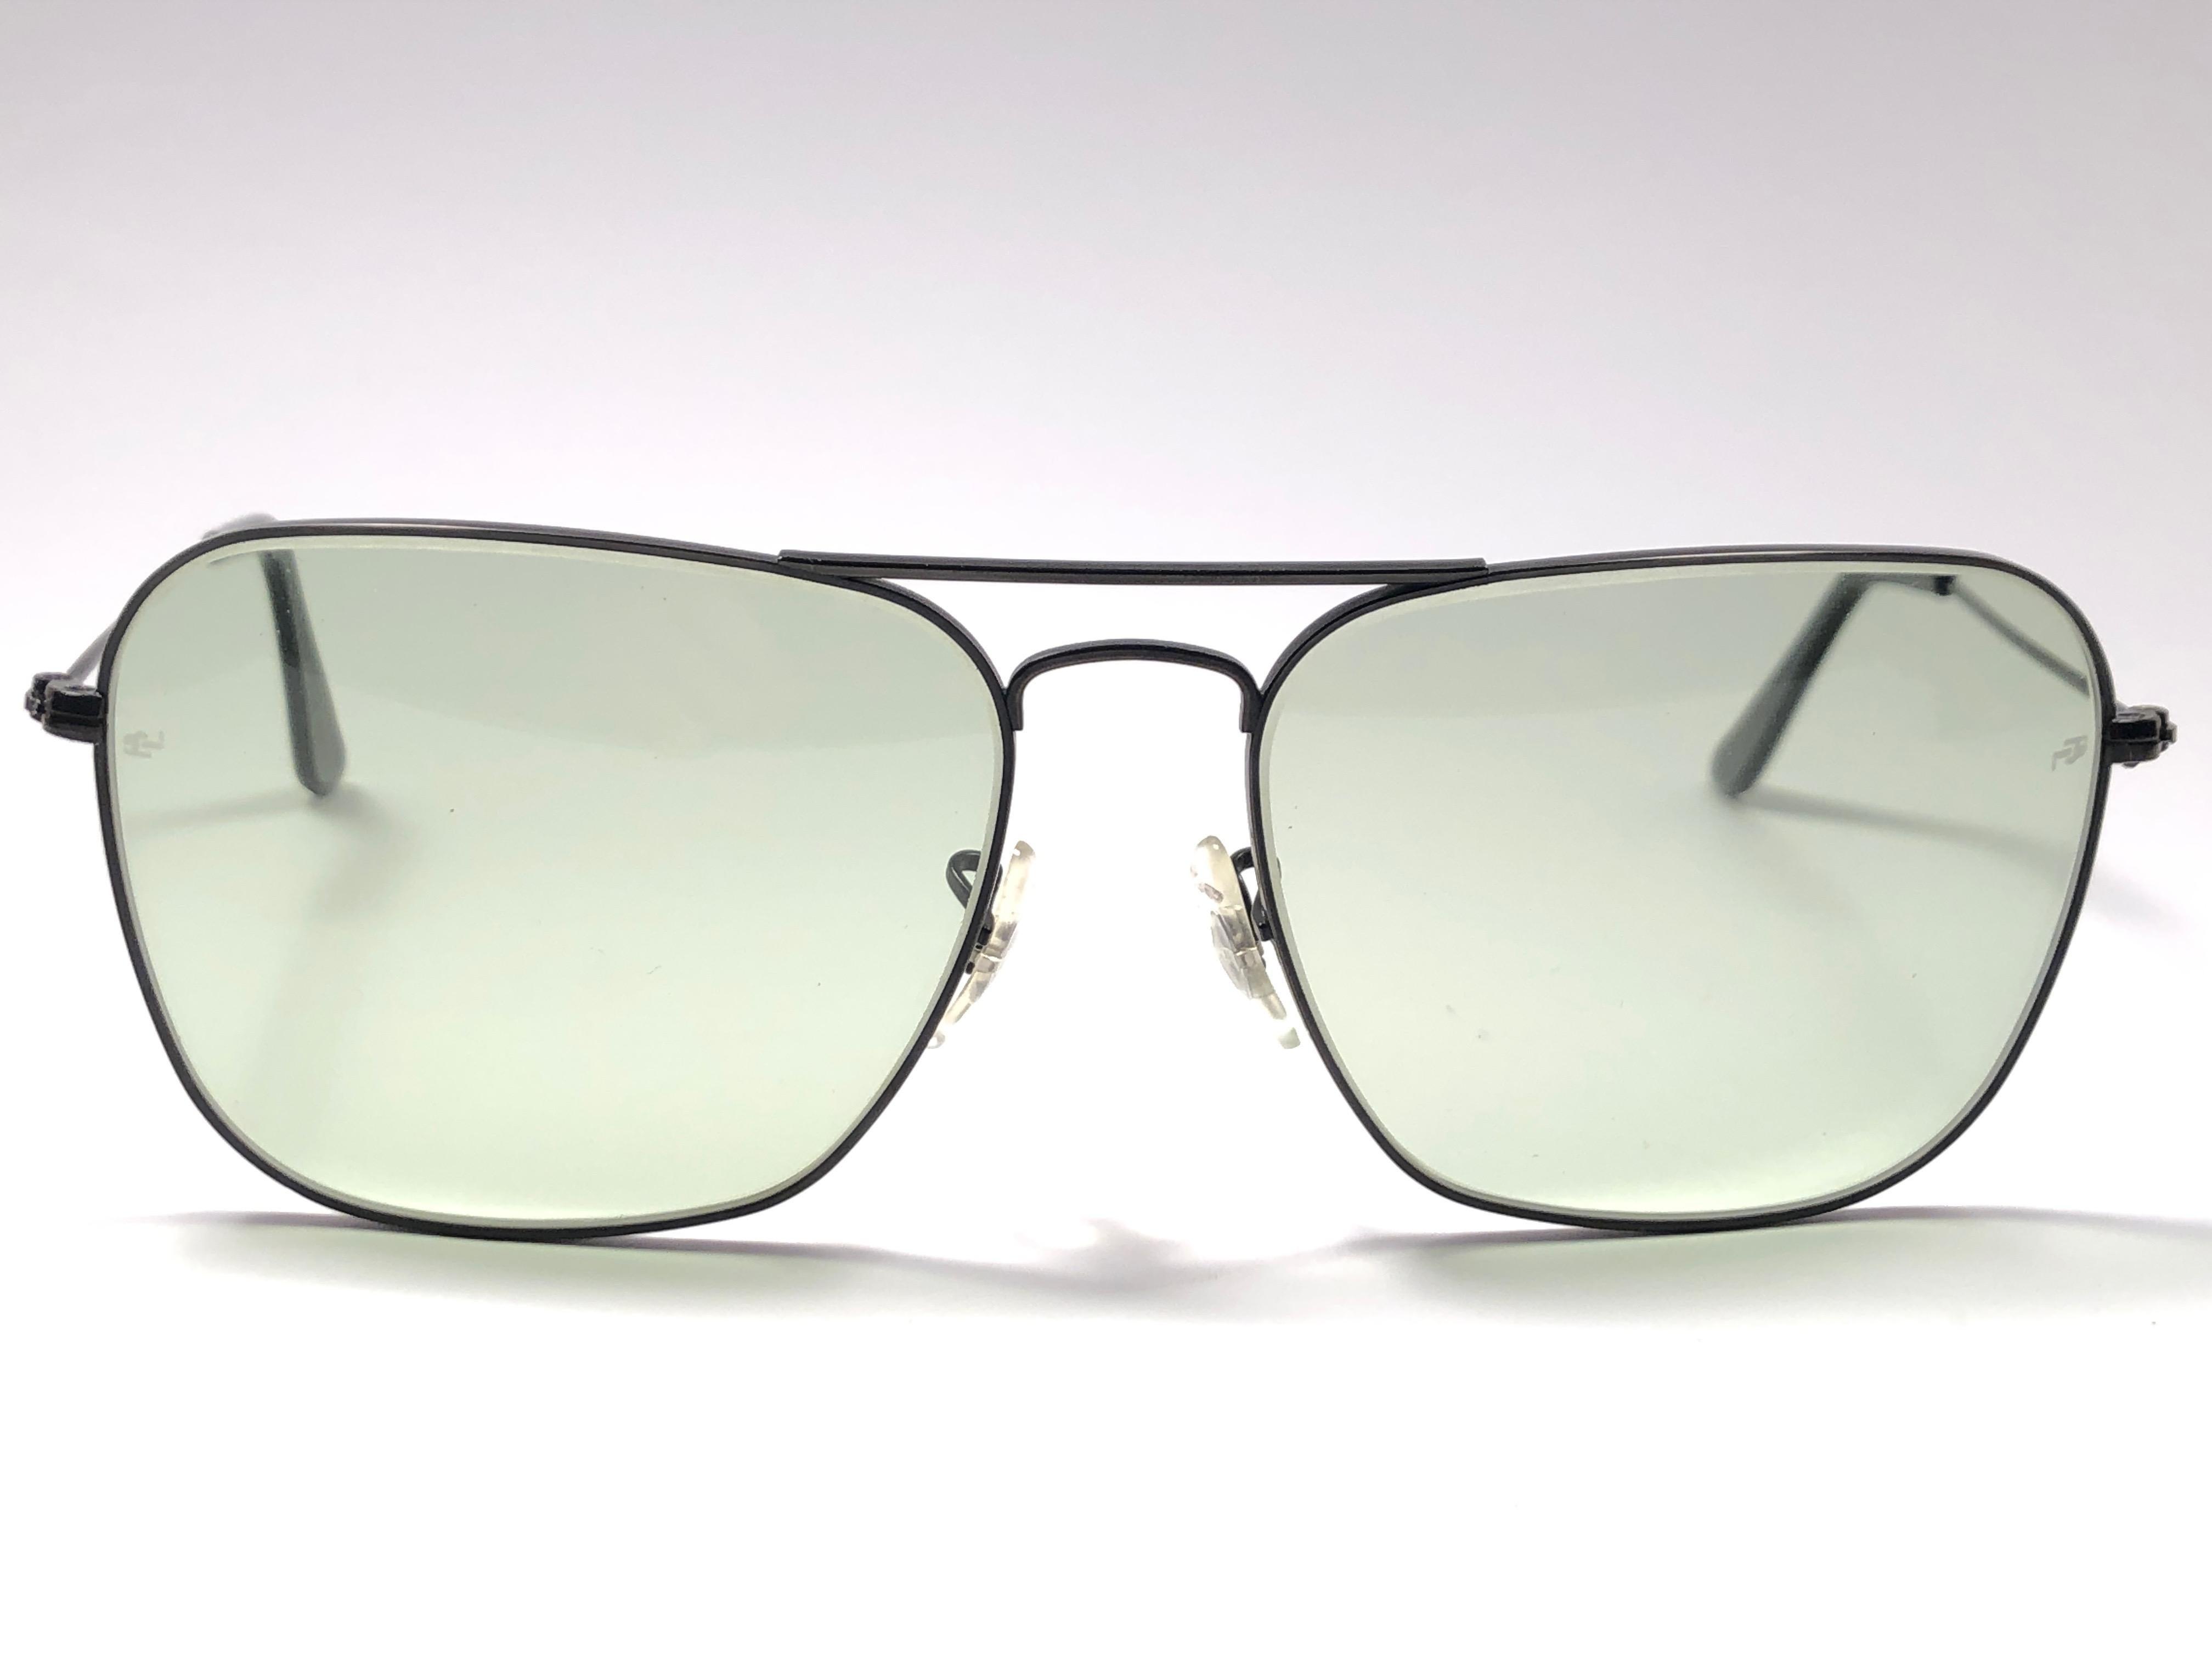 668bf6af51f Ray Ban Vintage Caravan Black Green Changeable Lenses B L Sunglasses